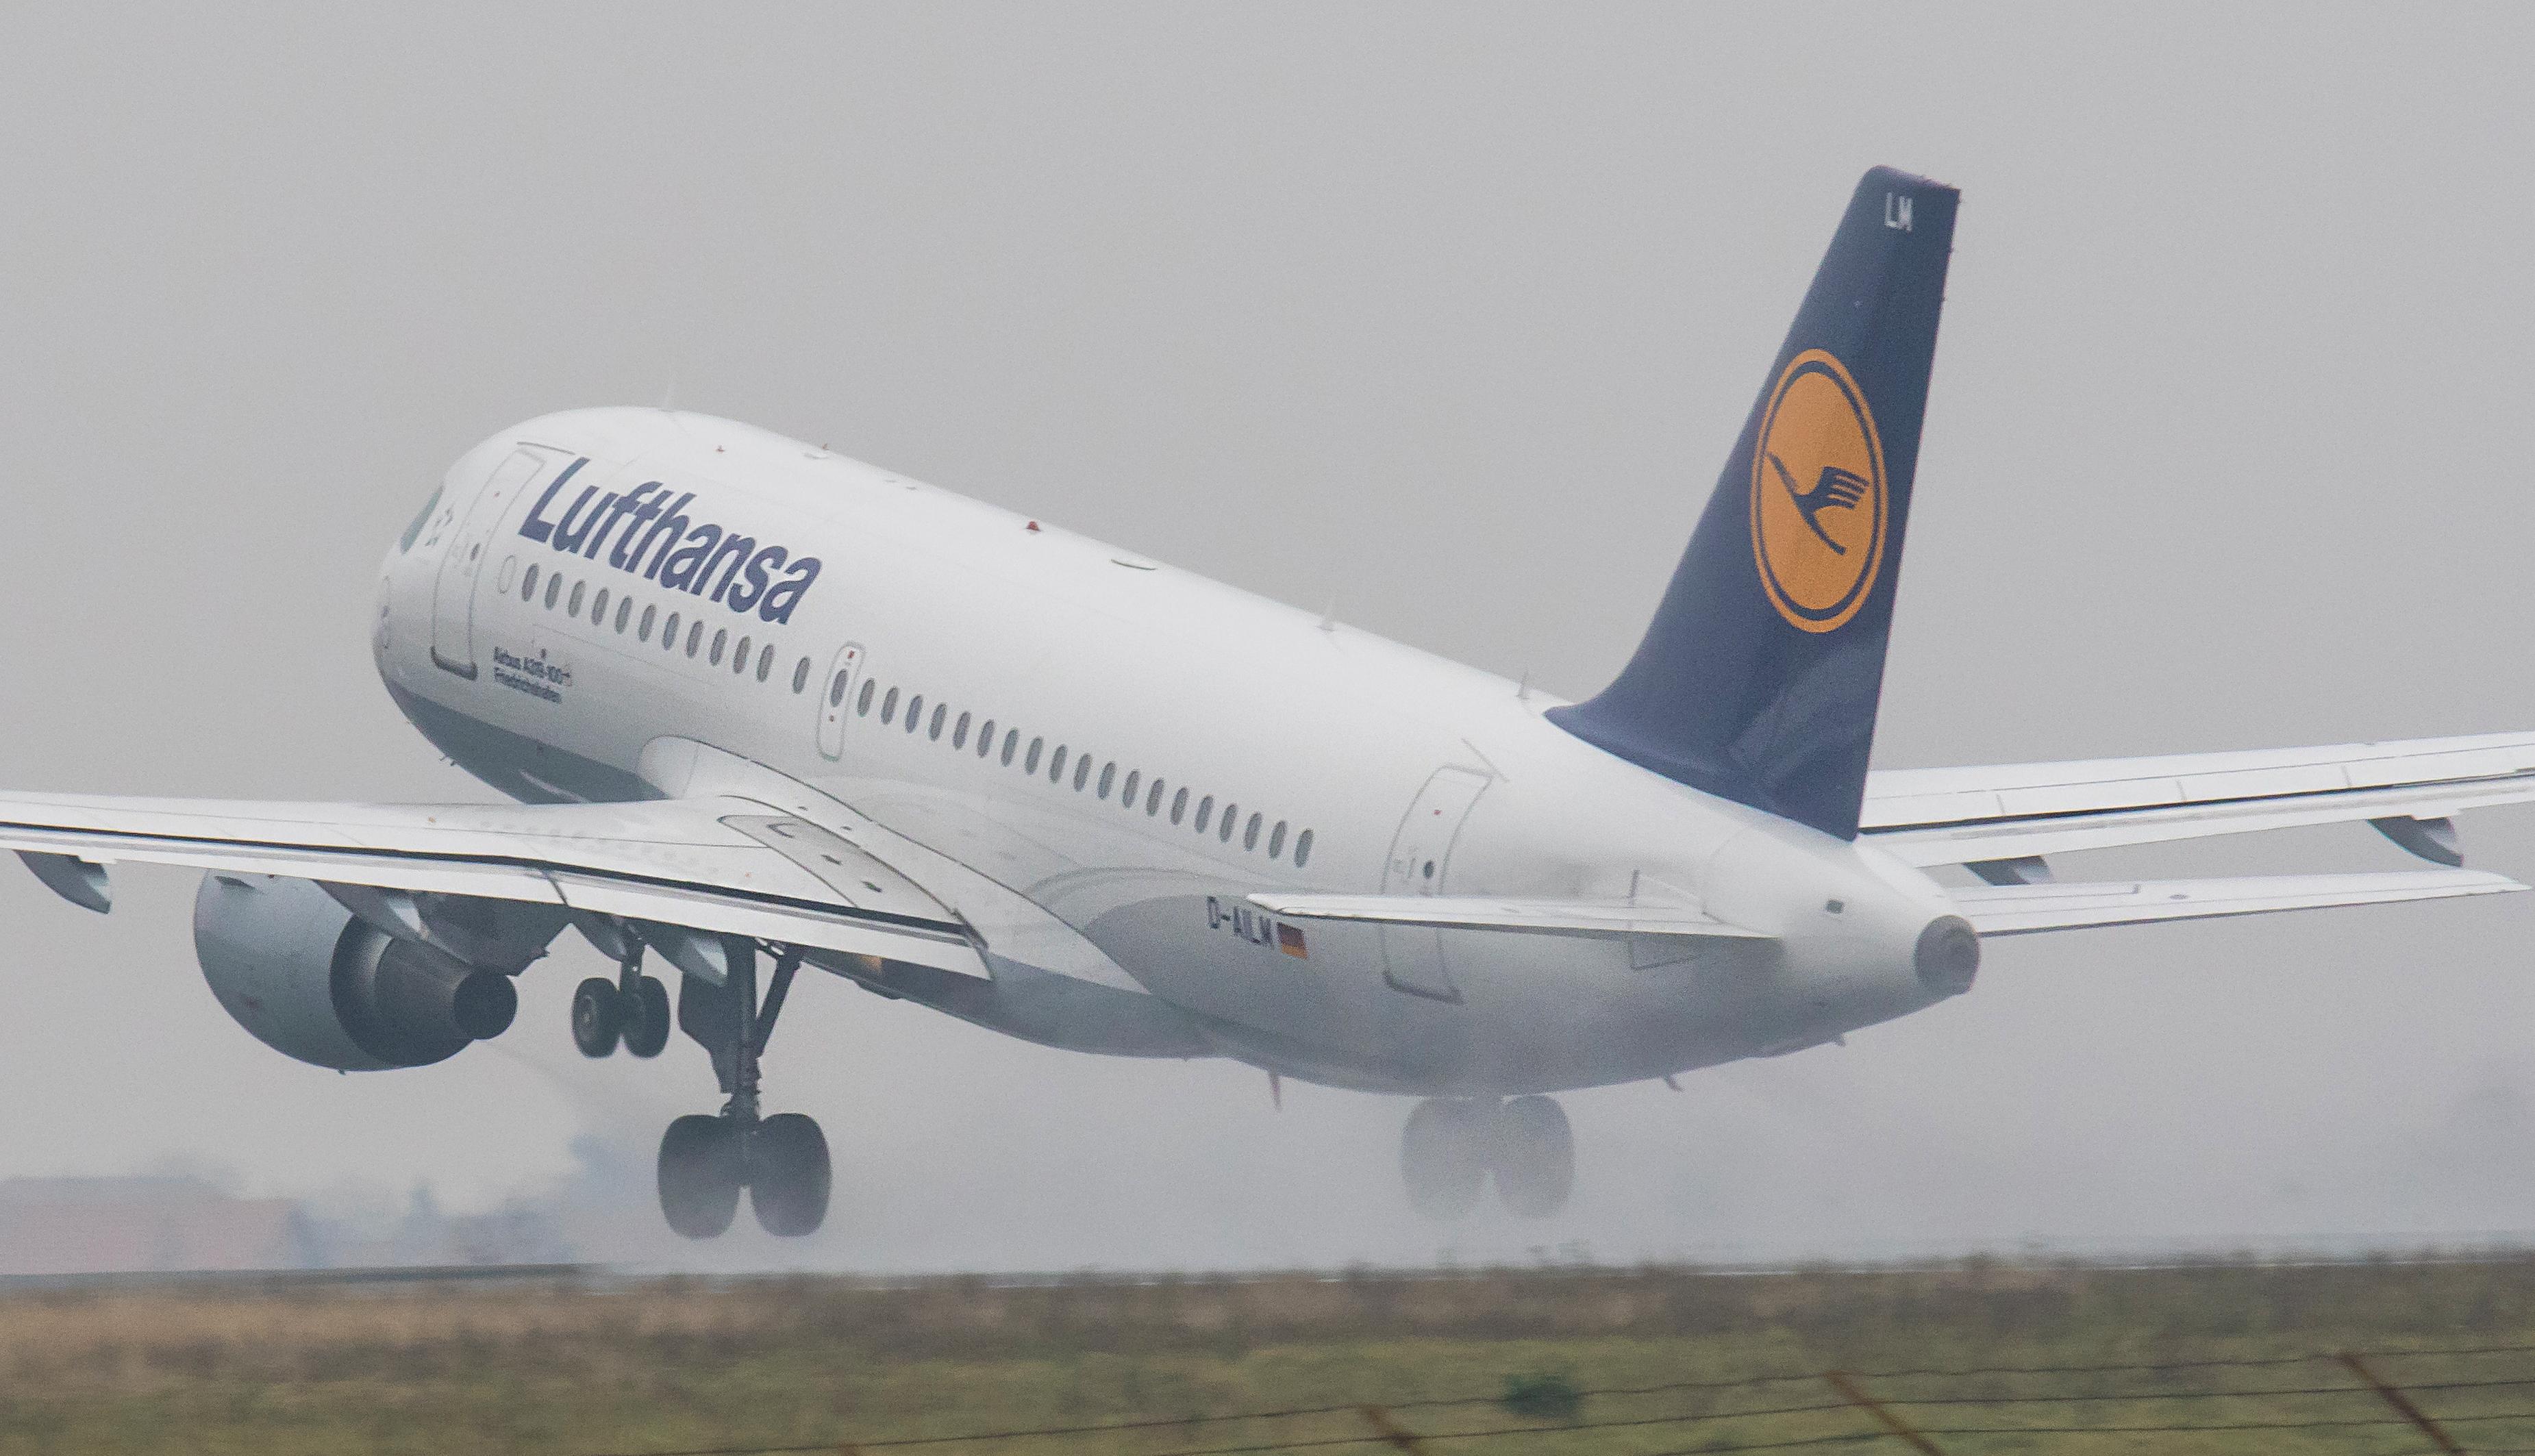 Lufthansa se transformira, samim tim i europsko zrakoplovno tržište / Foto: Dragan Trifunović